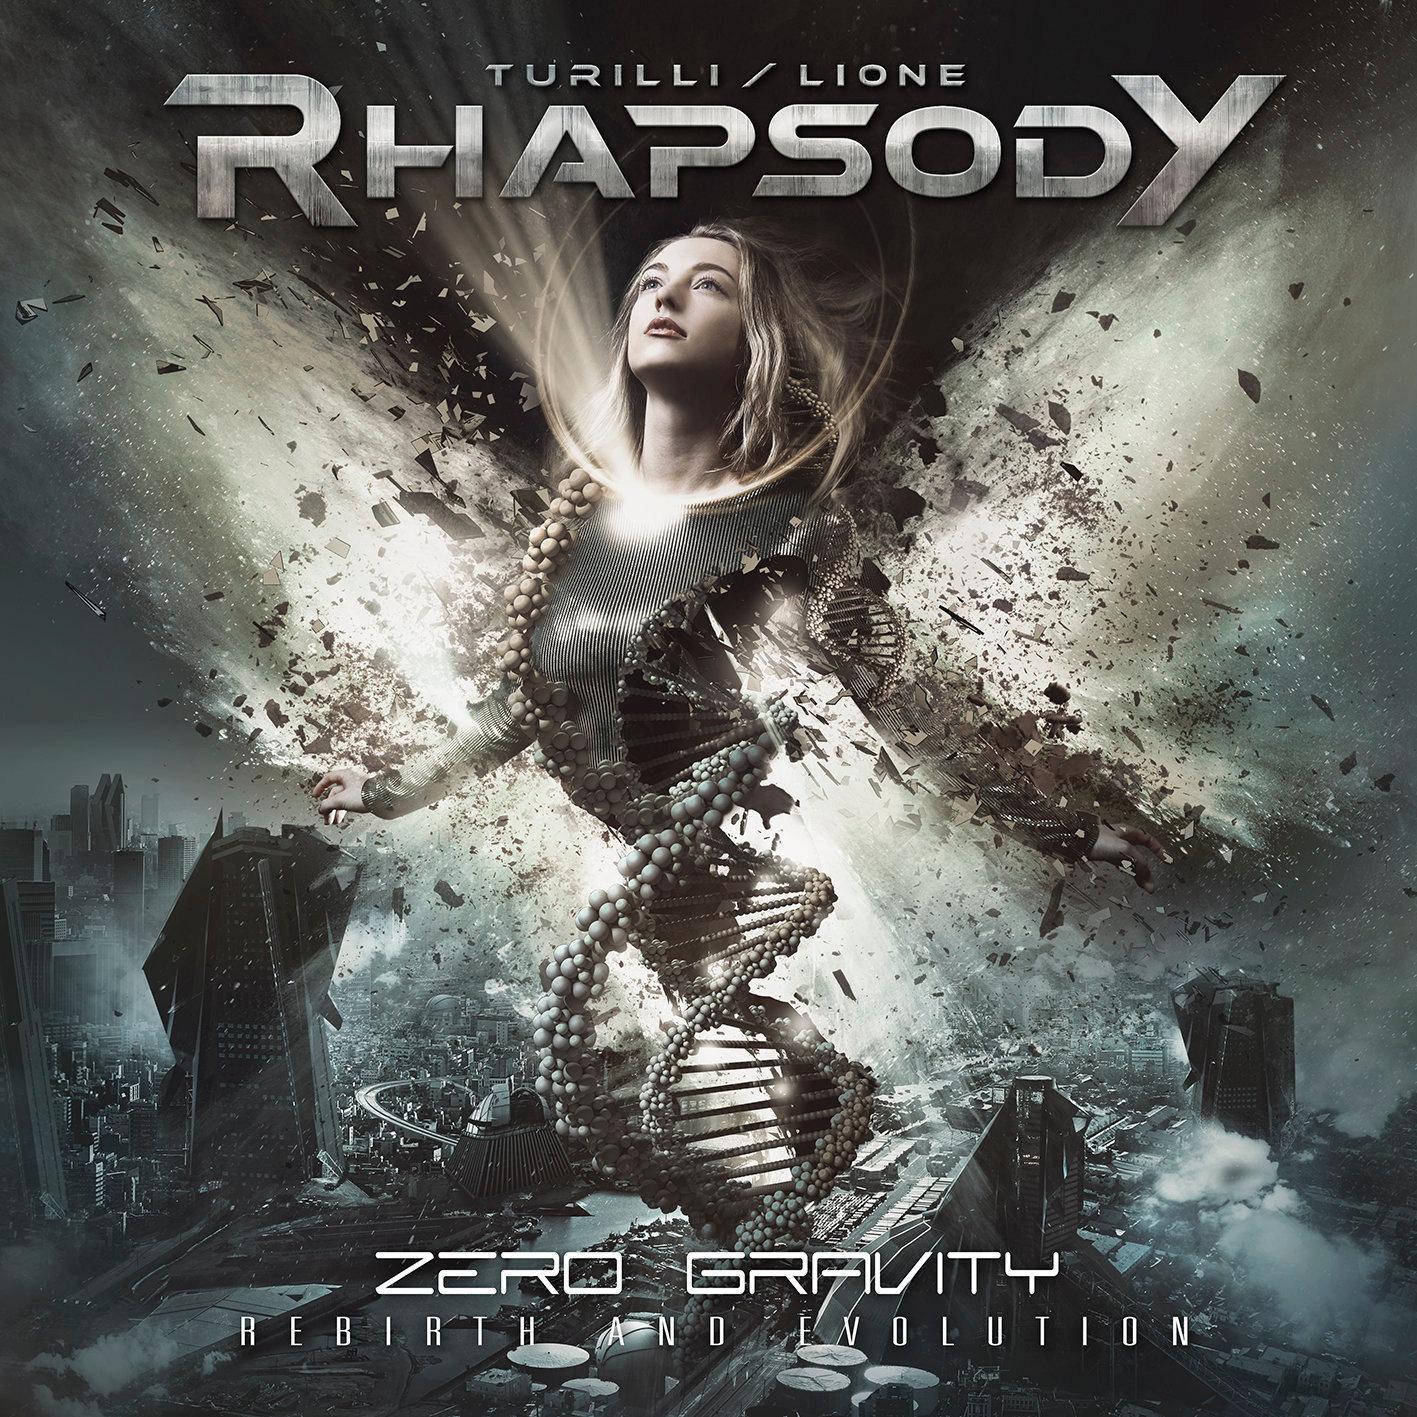 Kritik zu Turilli/Lione Rhapsody ZERO GRAVITY (REBIRTH AND EVOLUTION)